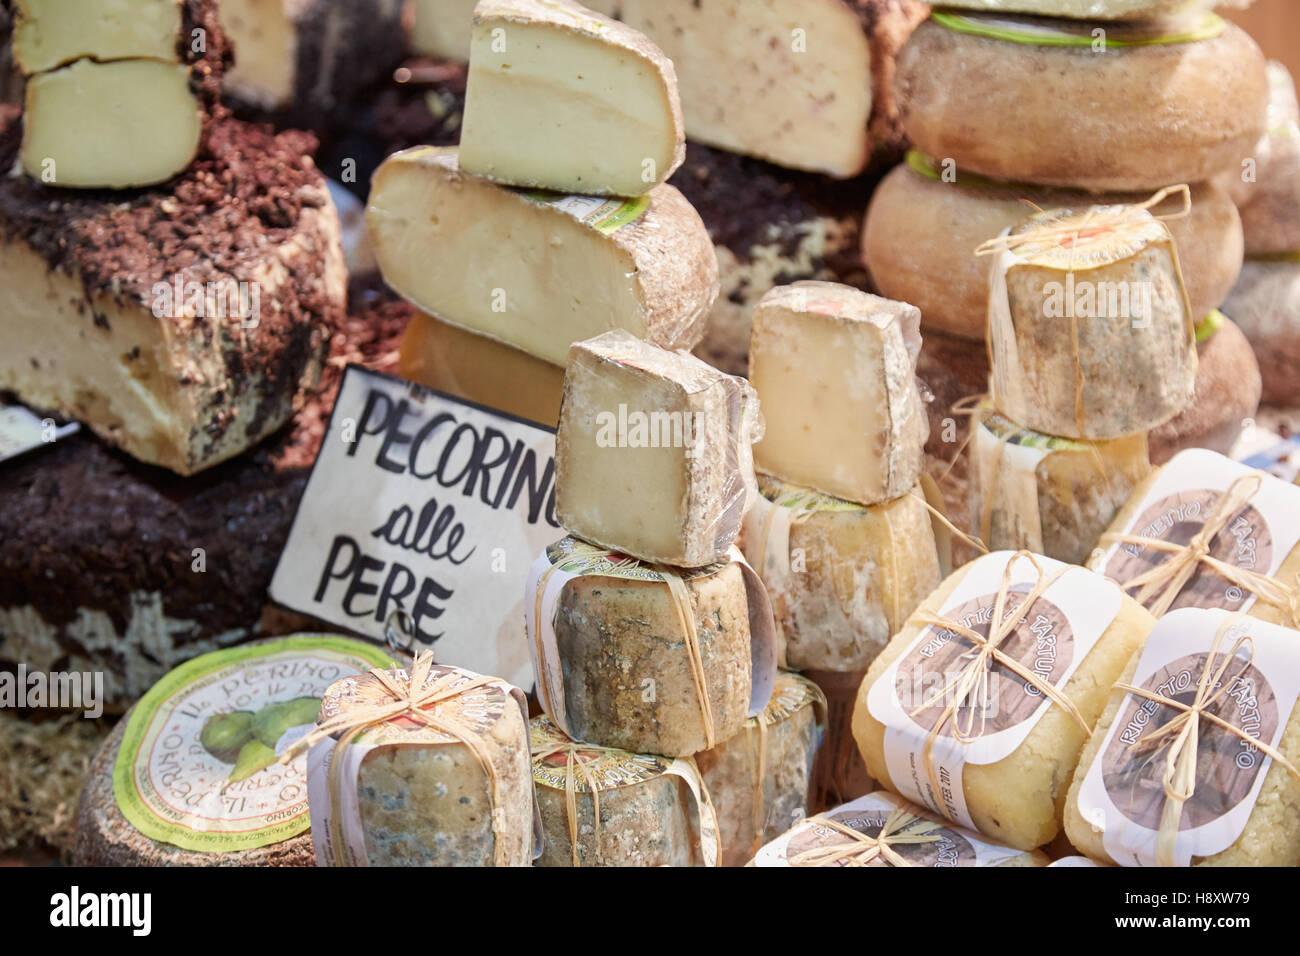 Típico queso a la venta durante la Feria de la trufa blanca de Alba en Alba, Italia Imagen De Stock